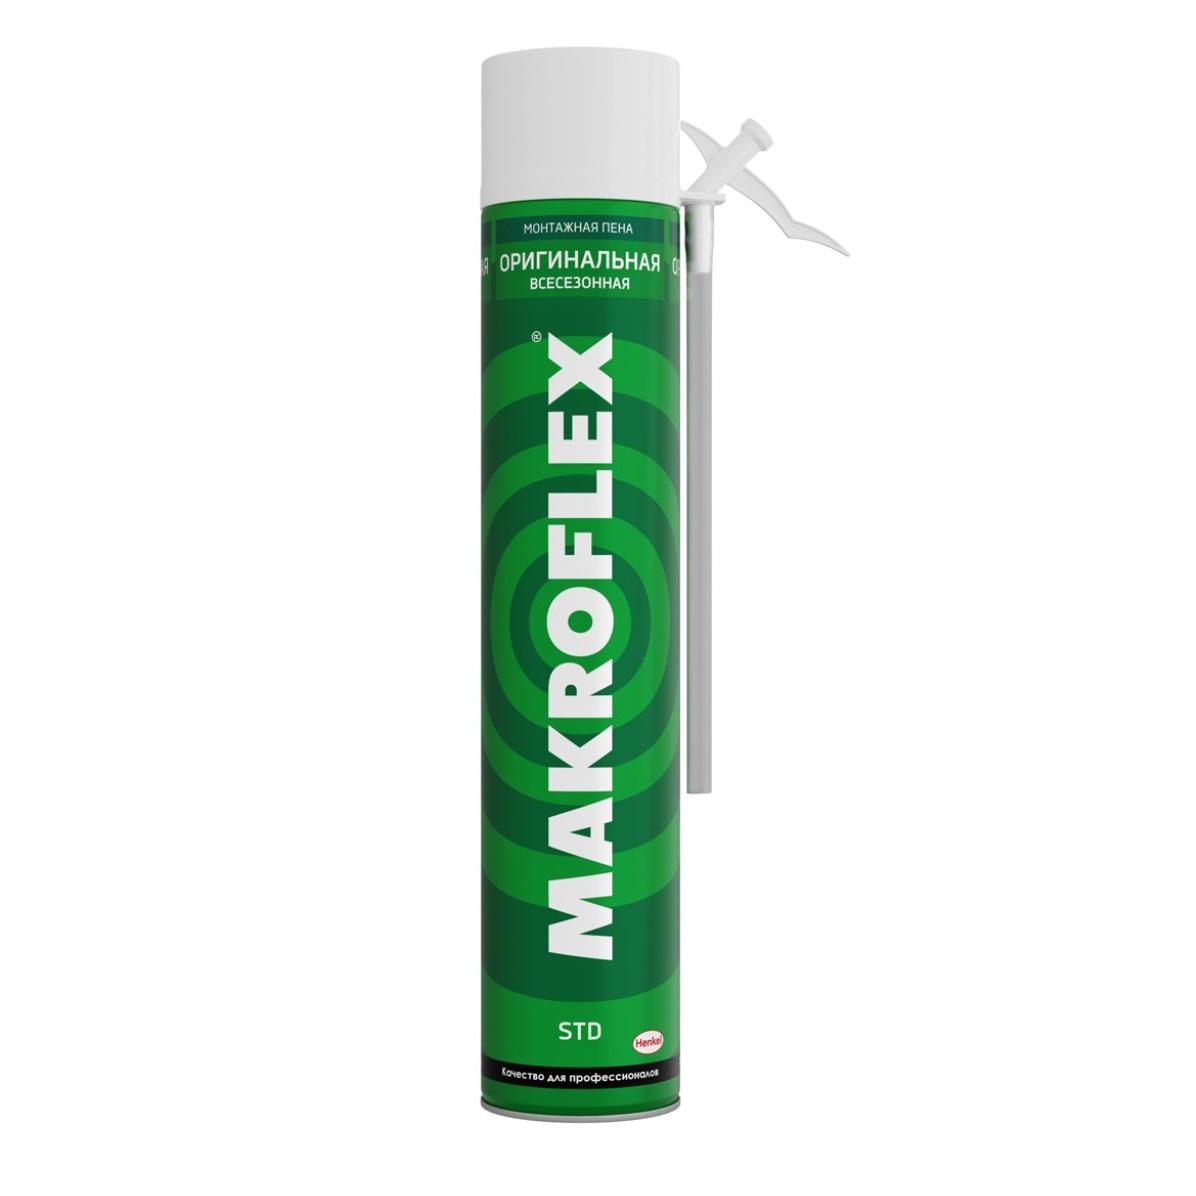 пена монтажная бытовая makroflex shaketec std стандарт 500 мл Пена бытовая Makroflex оригинальная всесезонная 750 мл